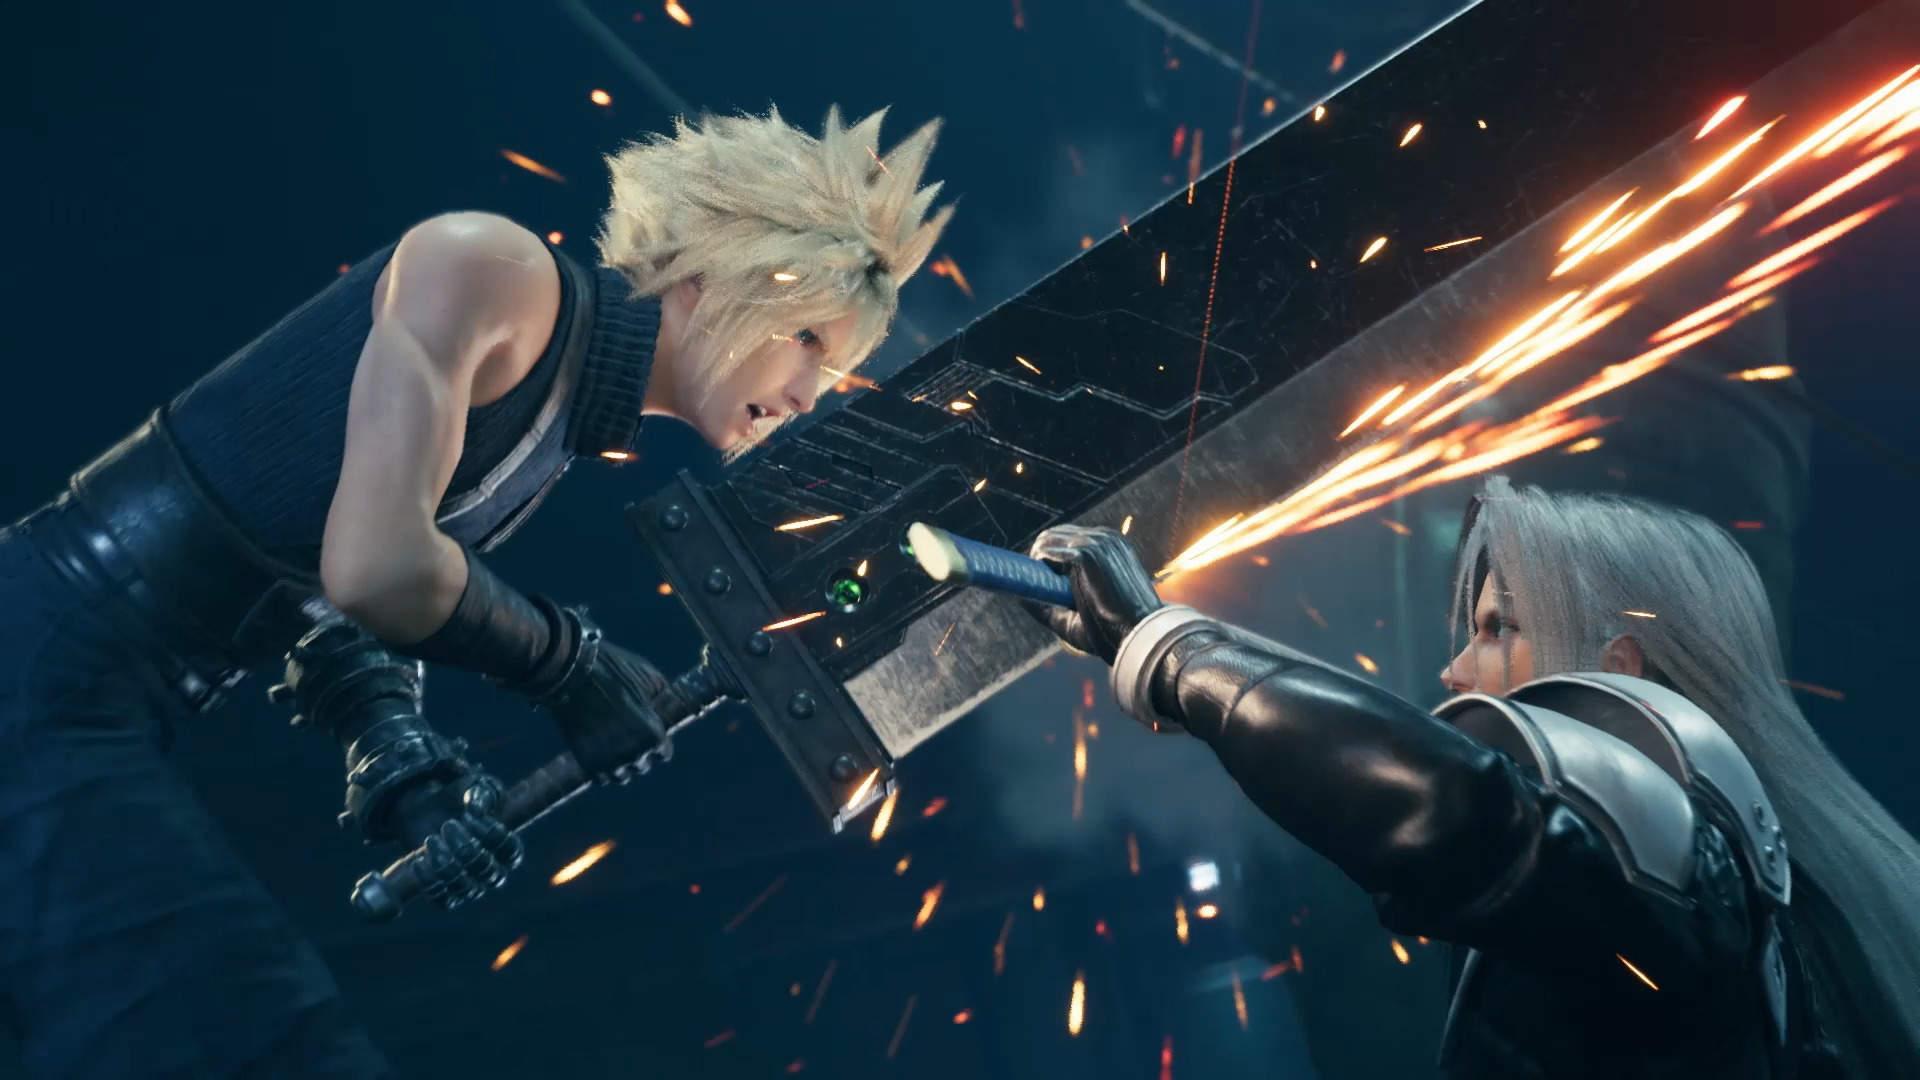 PS4 Final Fantasy VII Remake Gameplay